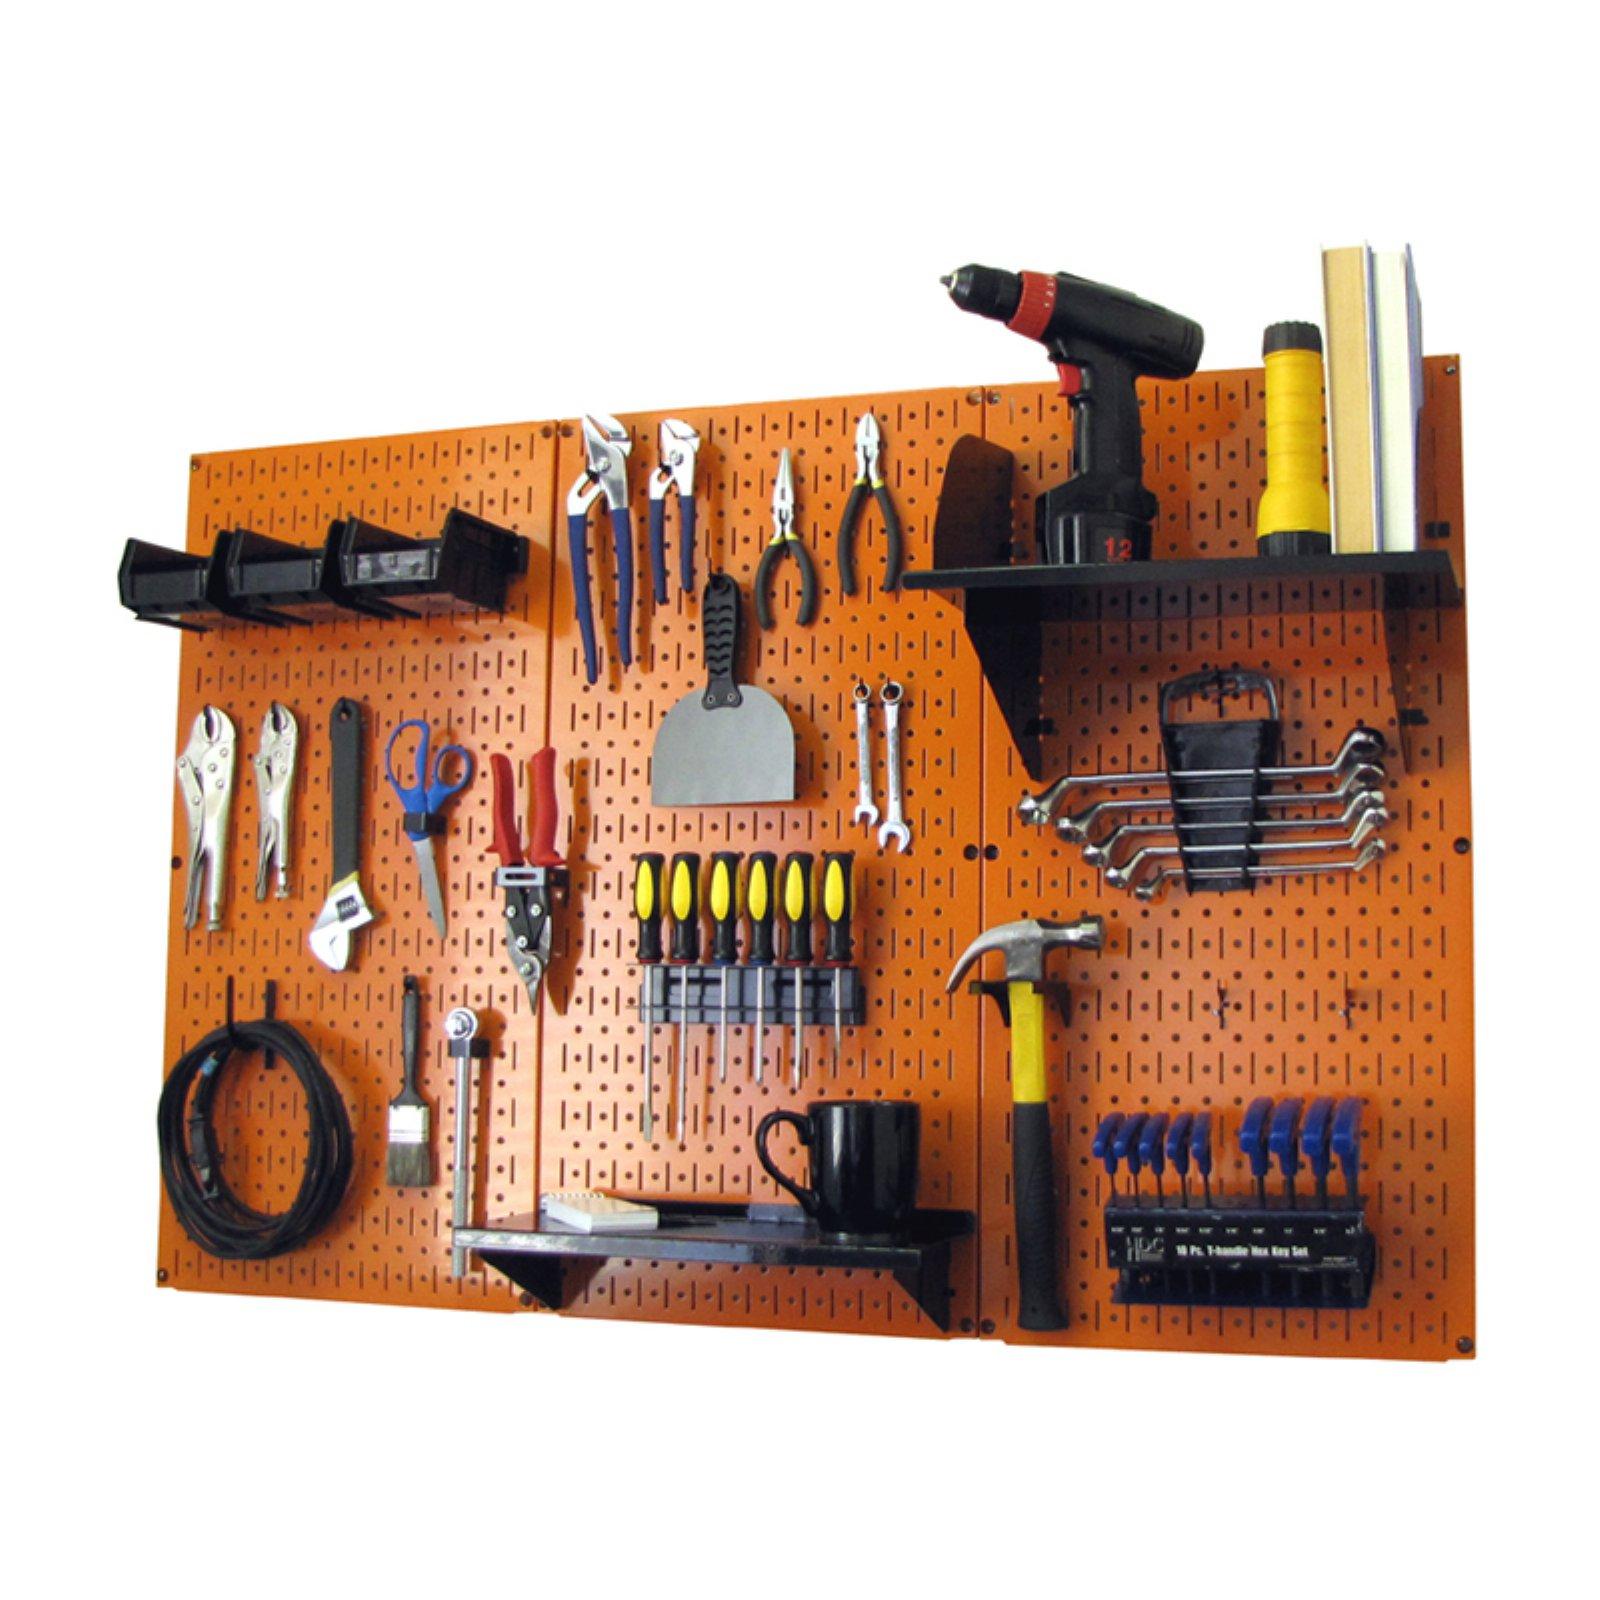 4ft Metal Pegboard Standard Tool Storage Kit - Orange Toolboard & Black Accessories